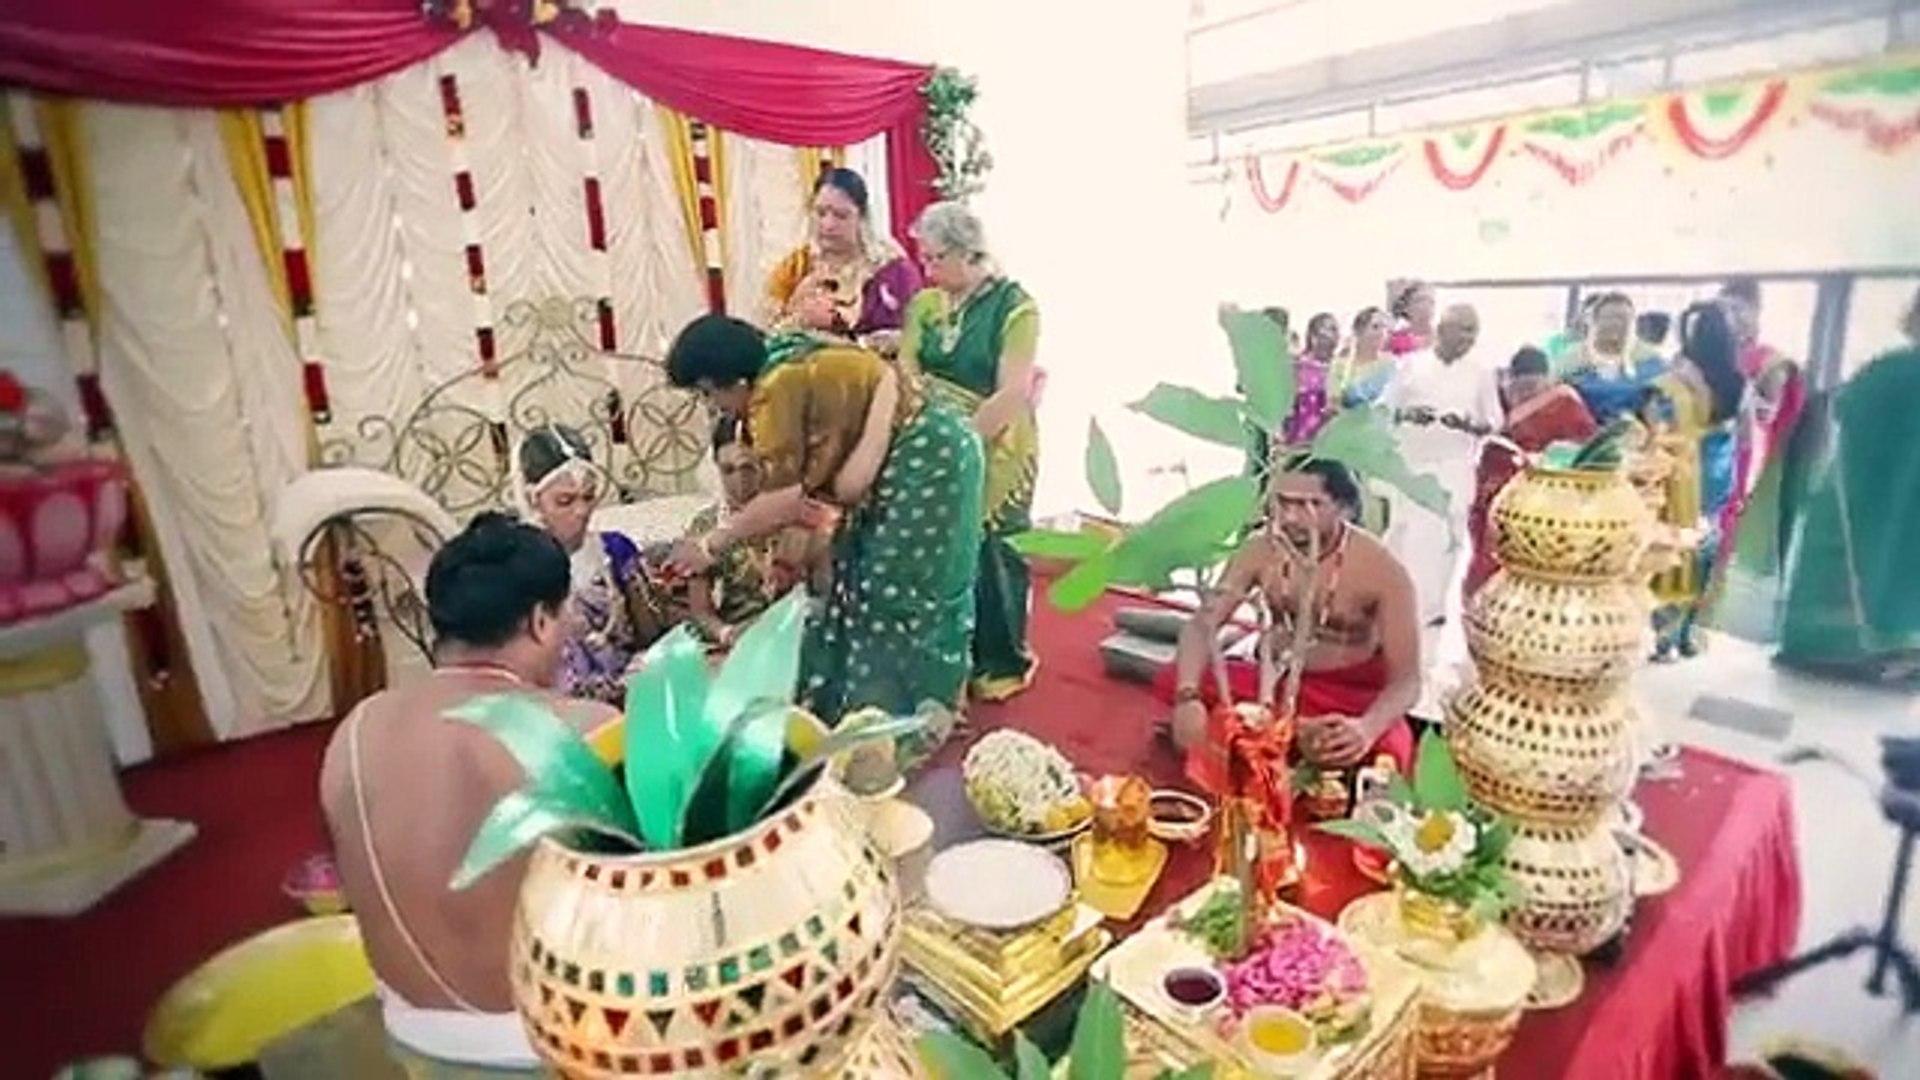 Singapore Cinematic Indian Wedding 2014 - Balamurugann & Logashriibavani